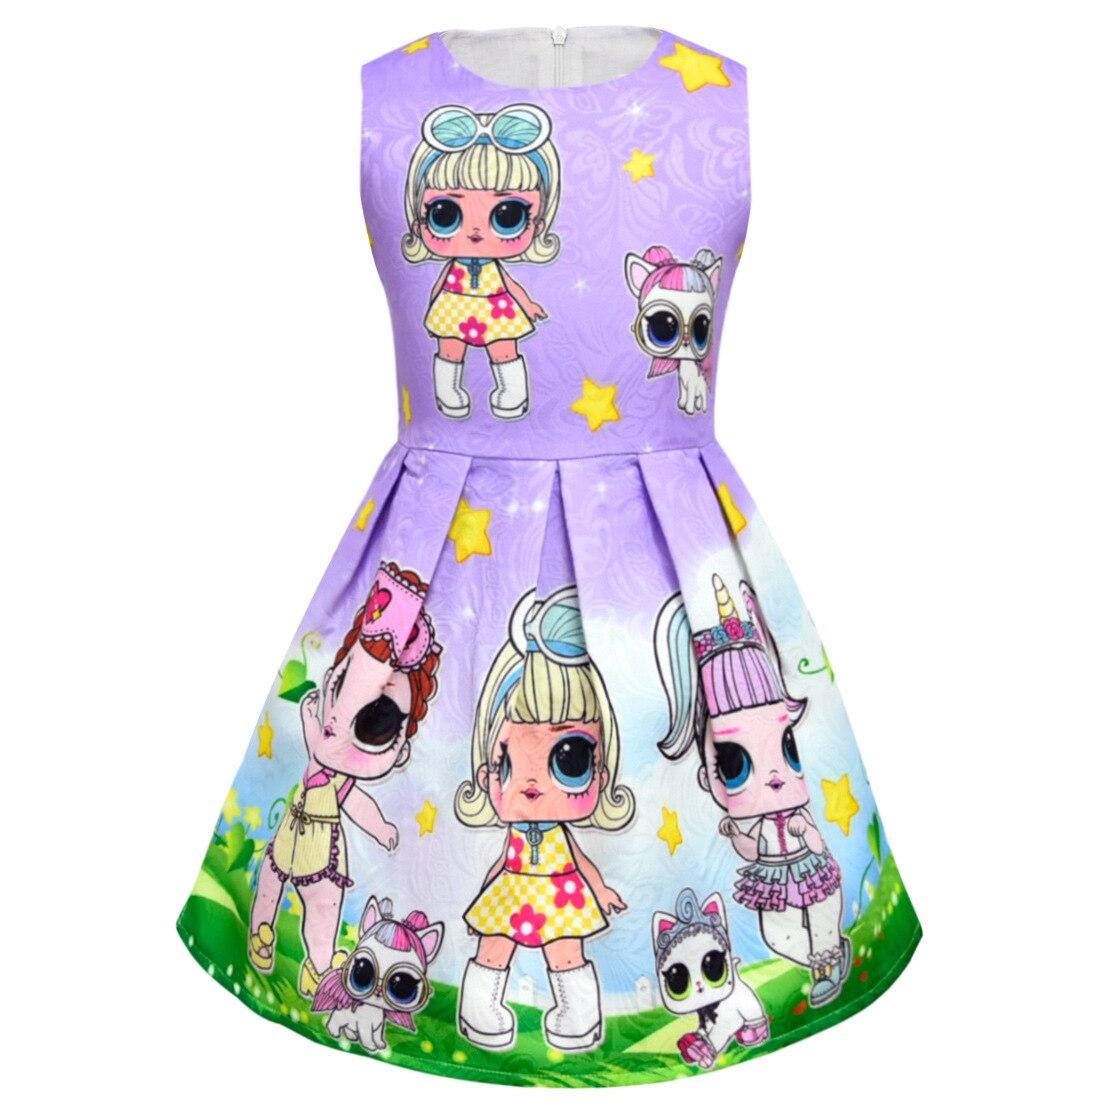 baby Girls Princess Birthday Party Ruffle vest Kids Dresses For LOL Surprise Dolls Tutu Dress For Girls Summer Dress Wedding все цены